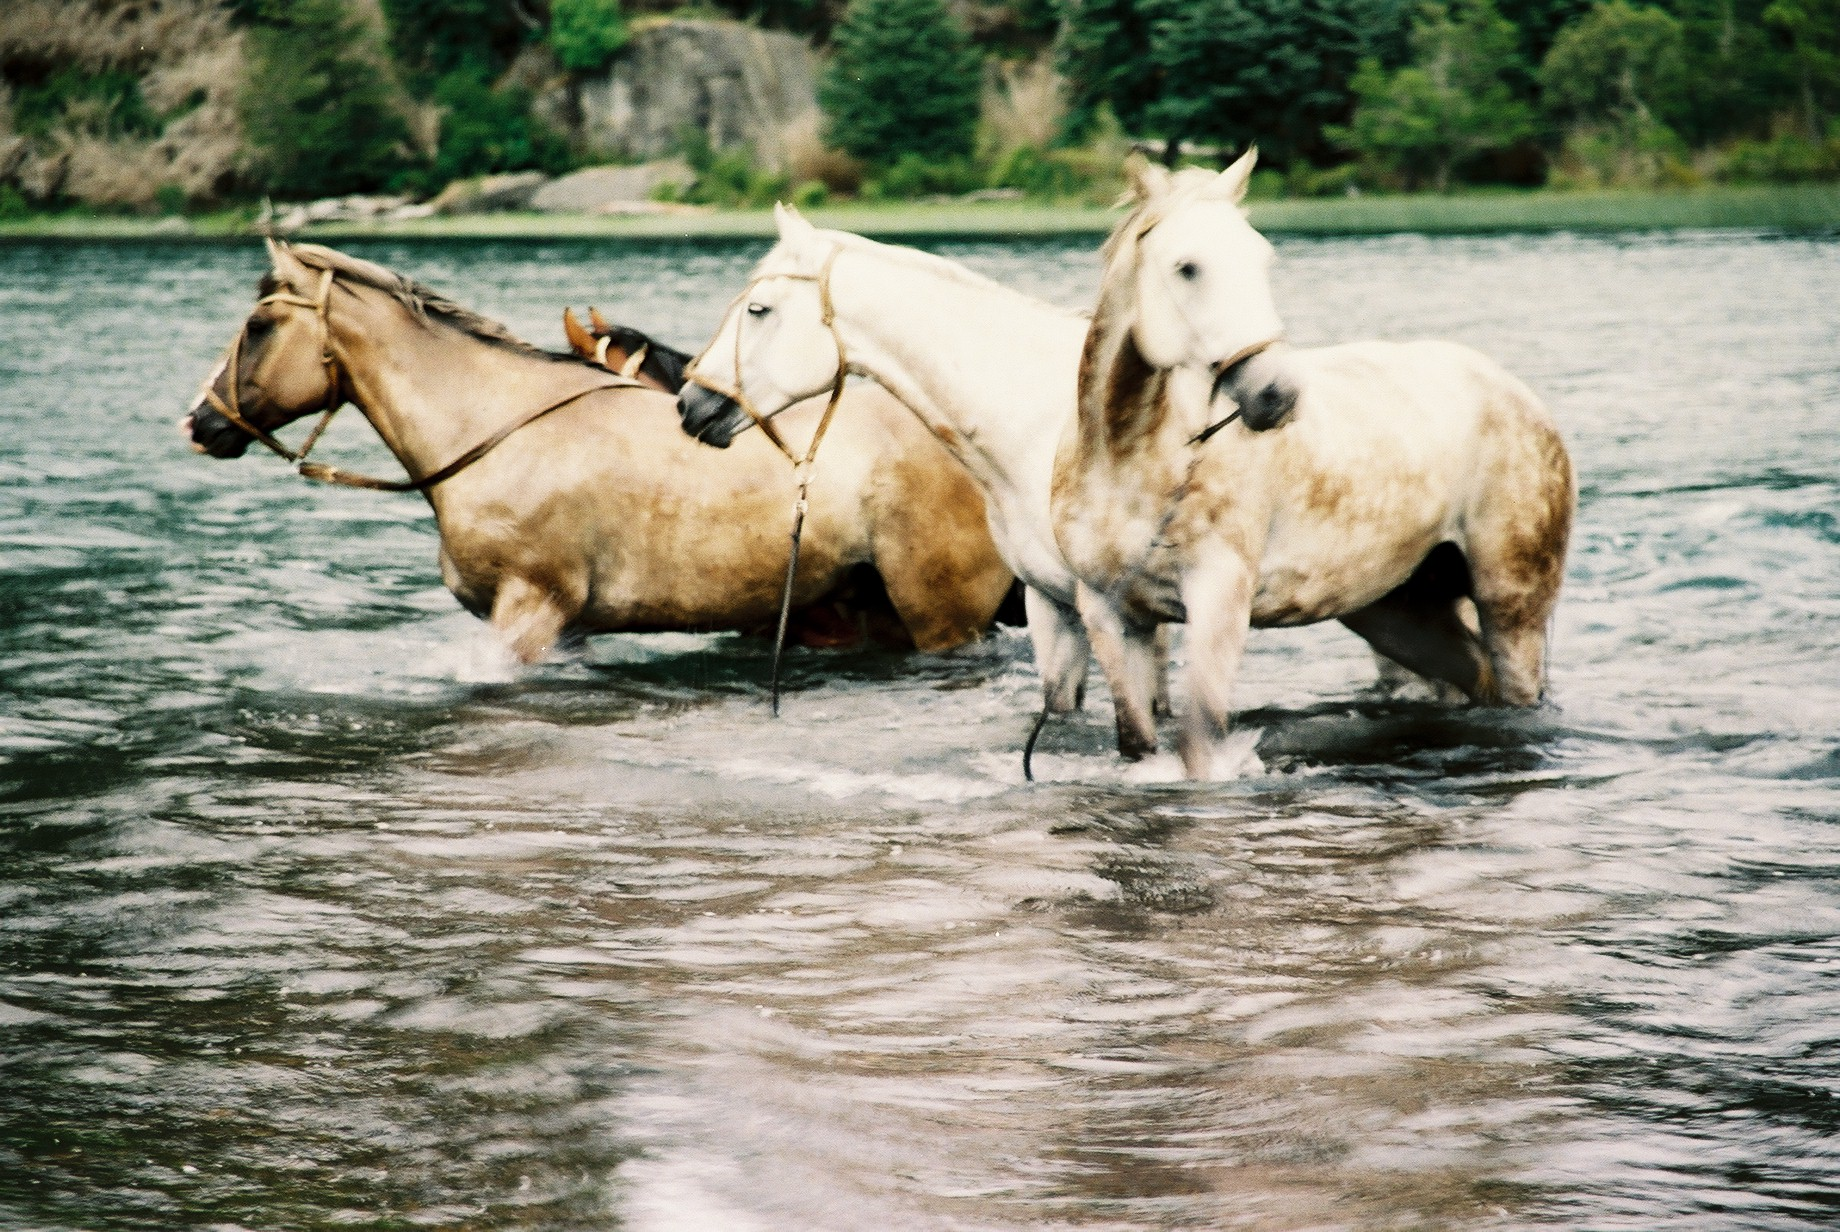 Three Horses in the River, Lanin.JPG